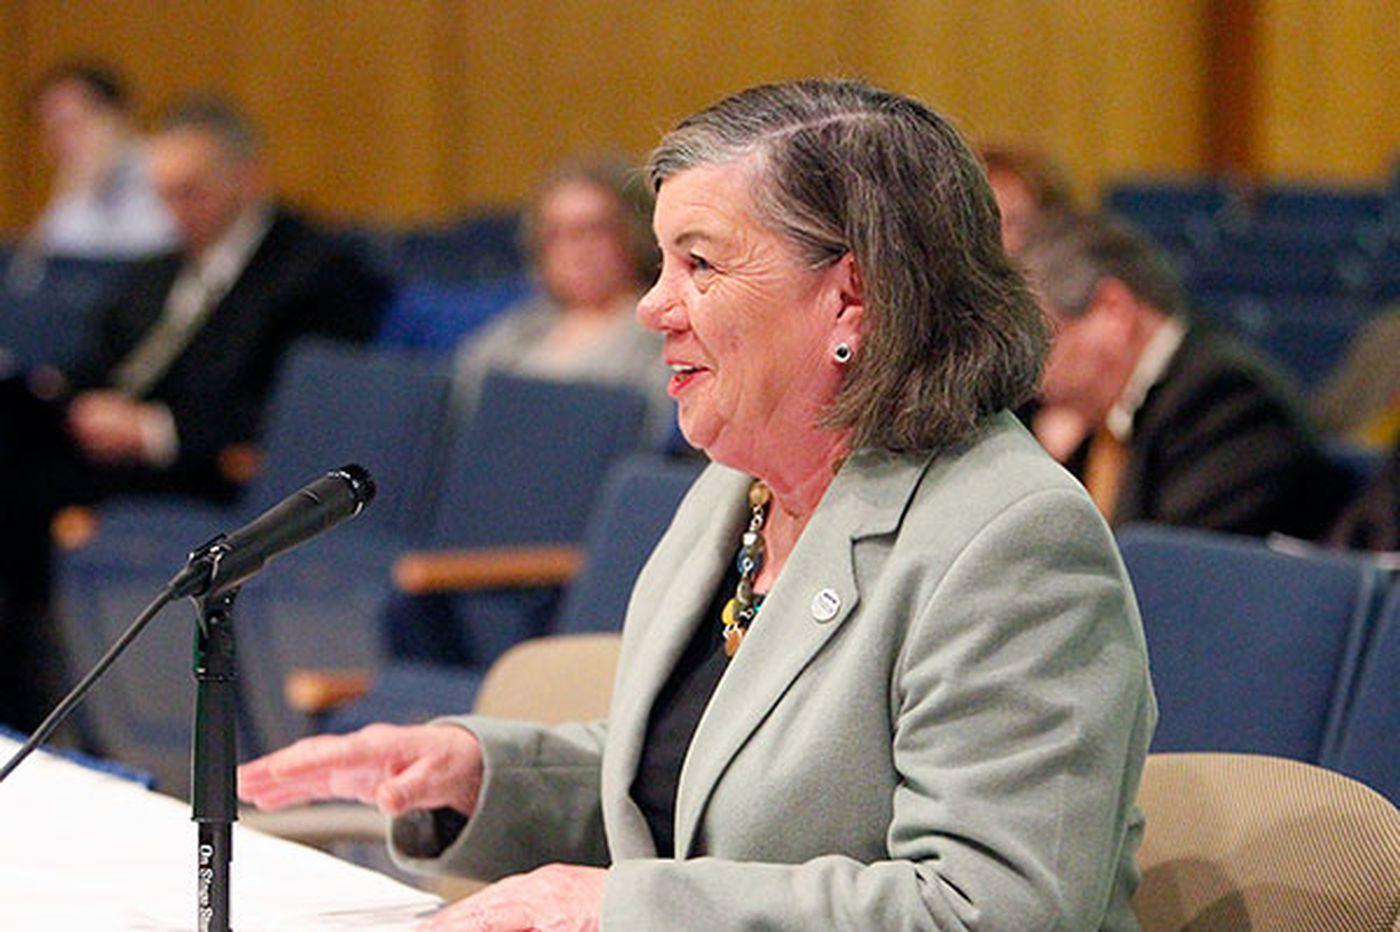 N.J. legislators lobbied on 2015 budget